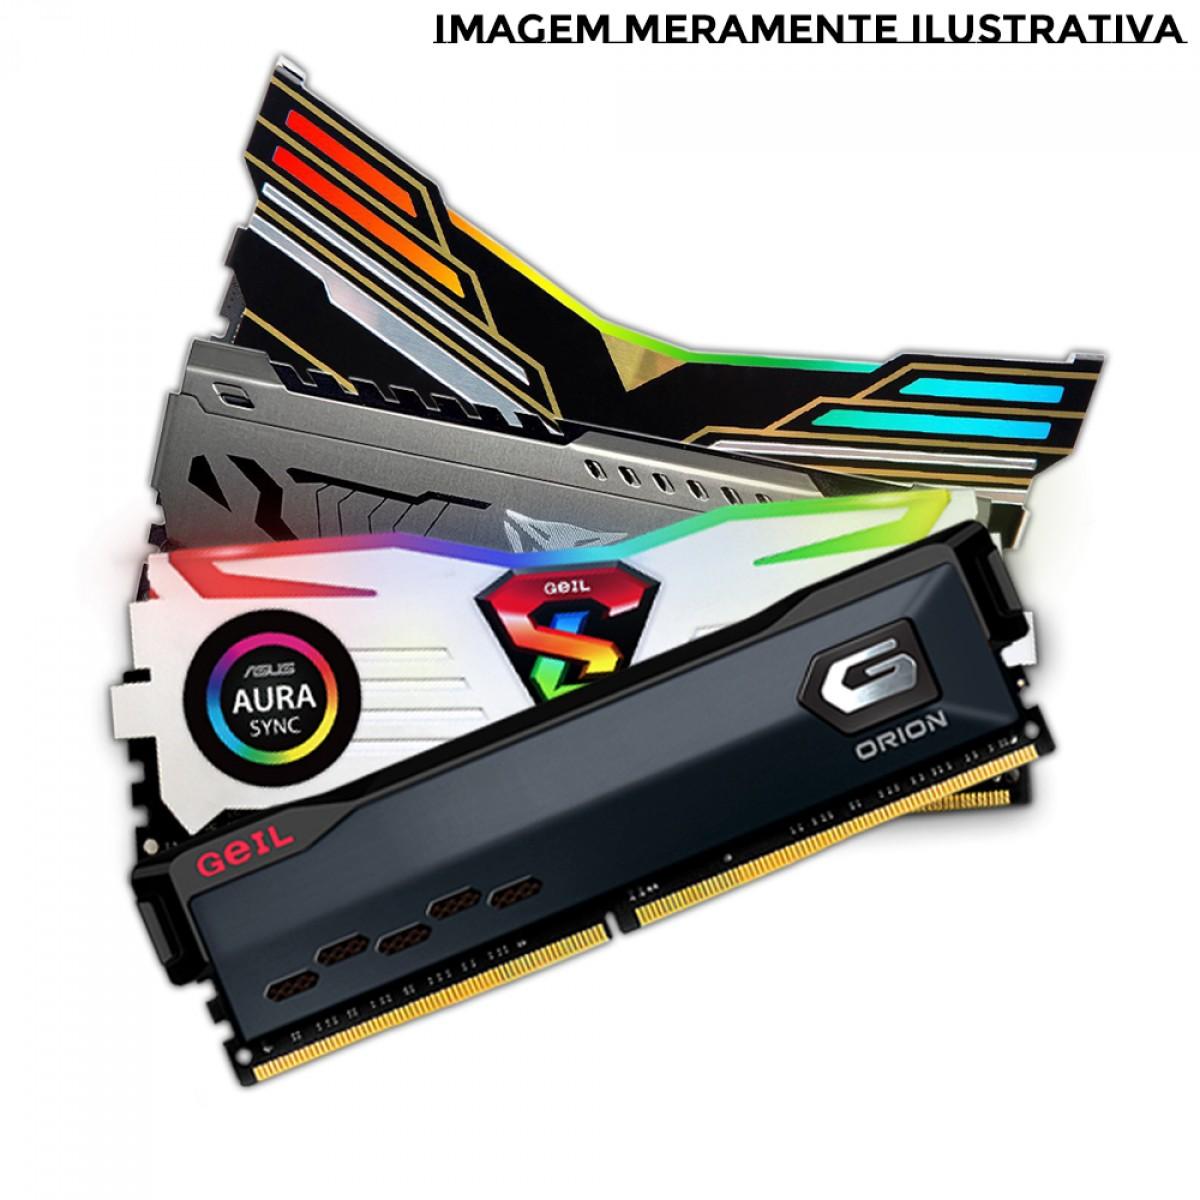 Kit Upgrade, GIGABYTE B360M AORUS Gaming 3 + Intel Core I3 9100F + 16GB DDR4 3000MHz